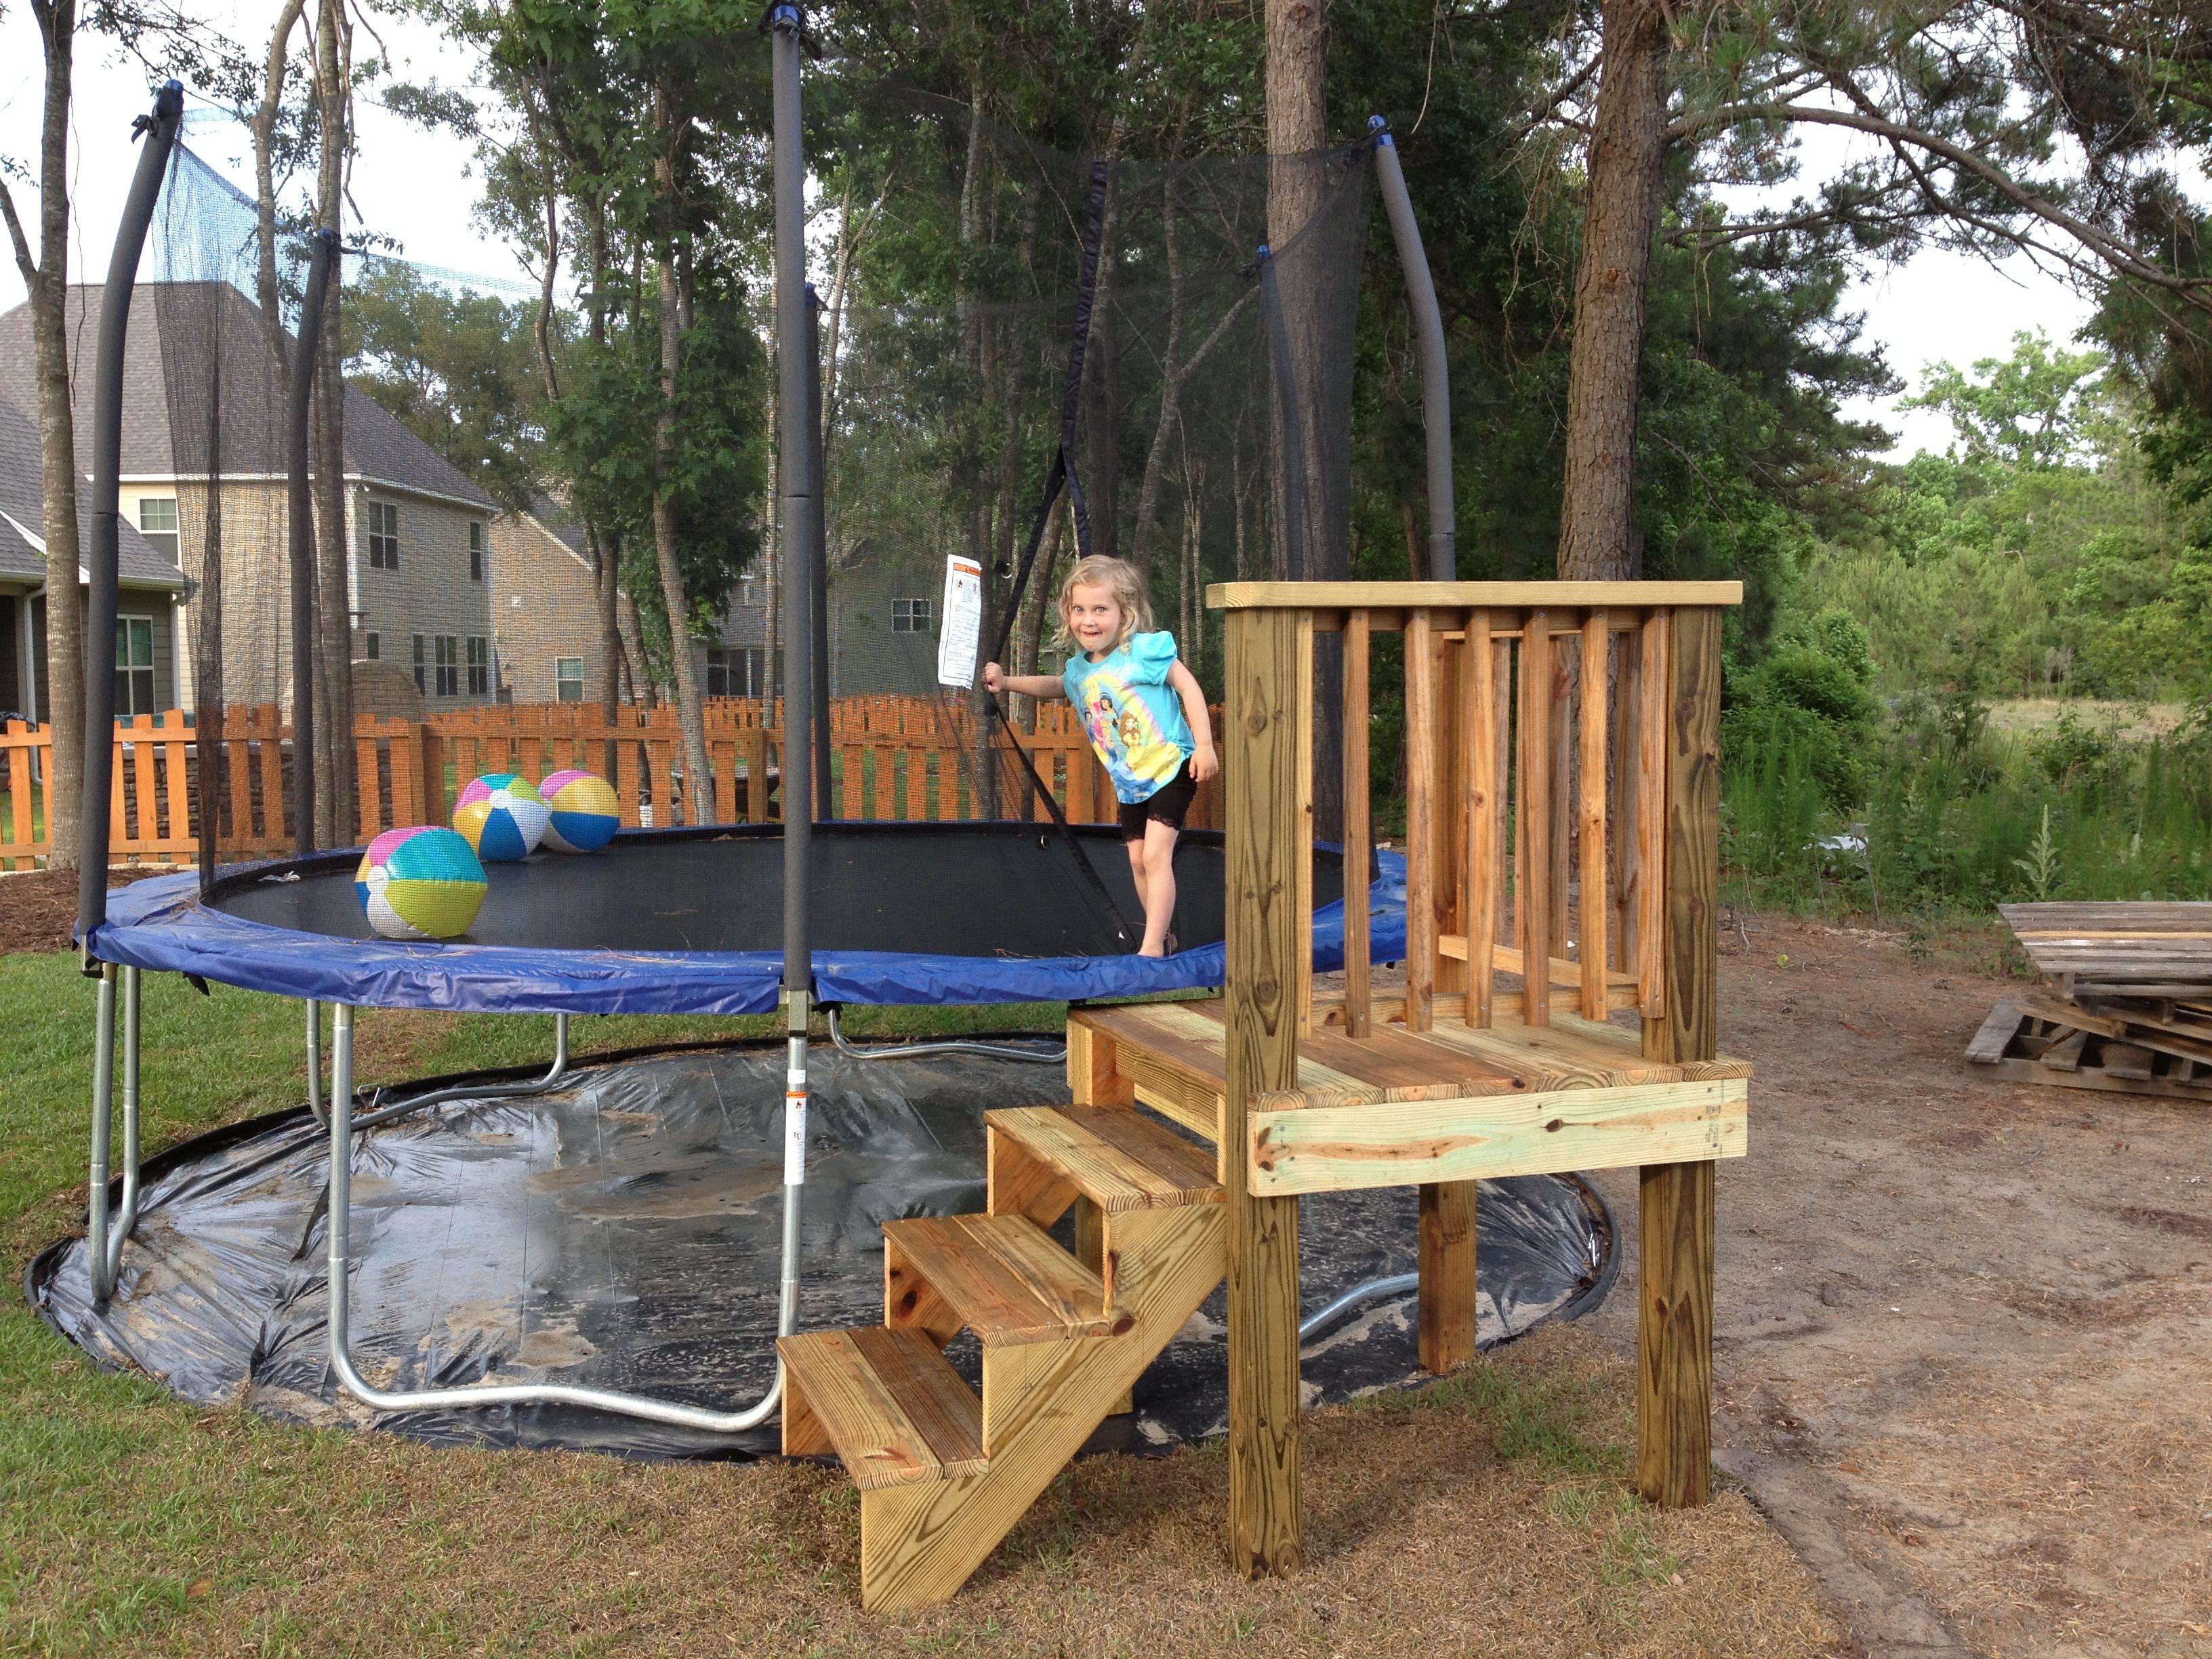 Pin By Jason Ruppert On Completed House Projects Backyard Trampoline Backyard Play Backyard Fun